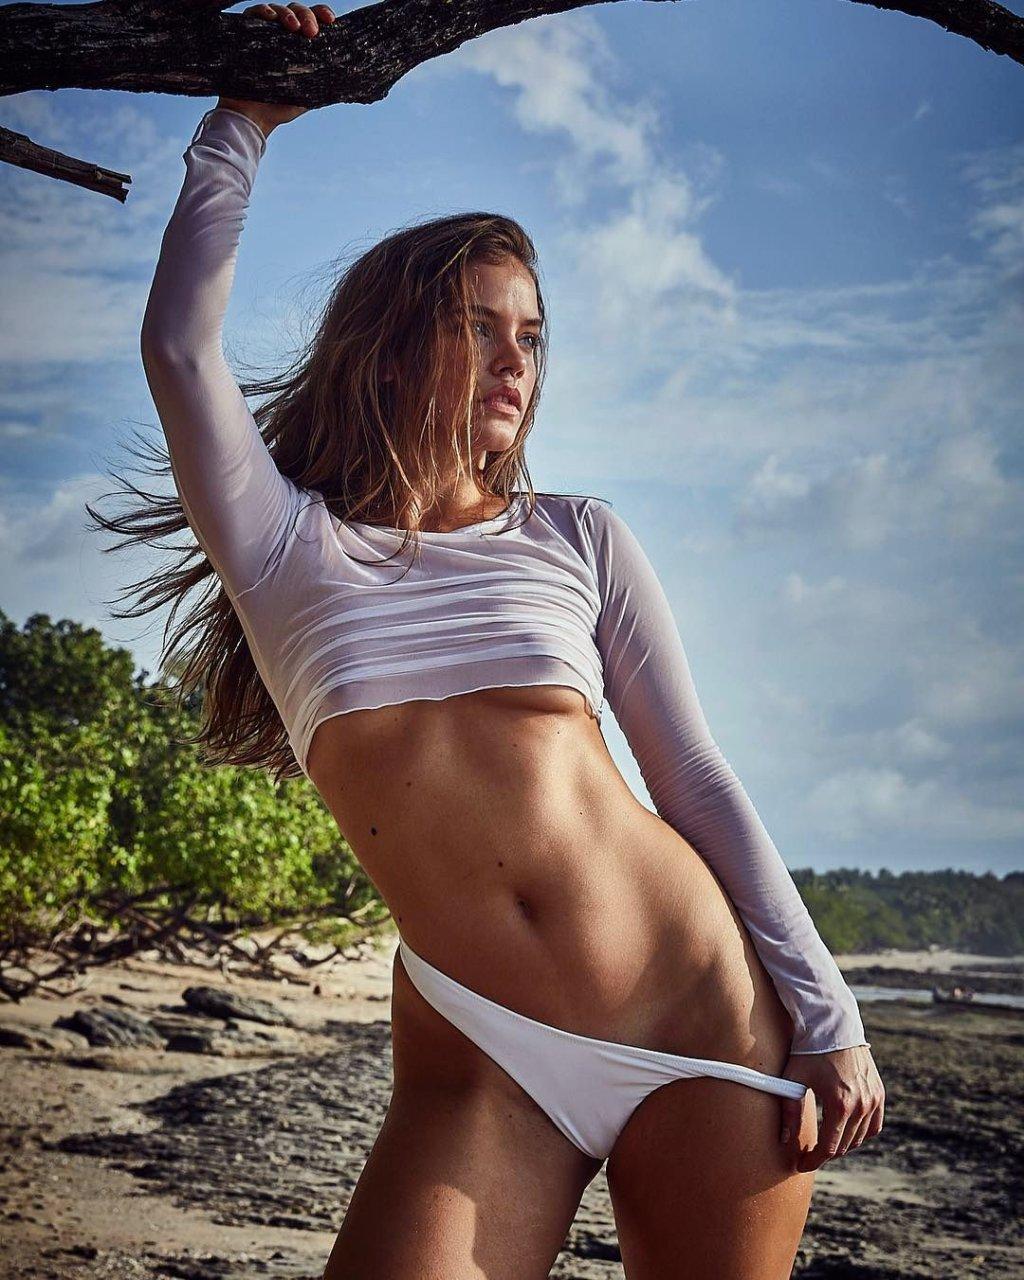 Barbara palvin topless 7 Photos new images